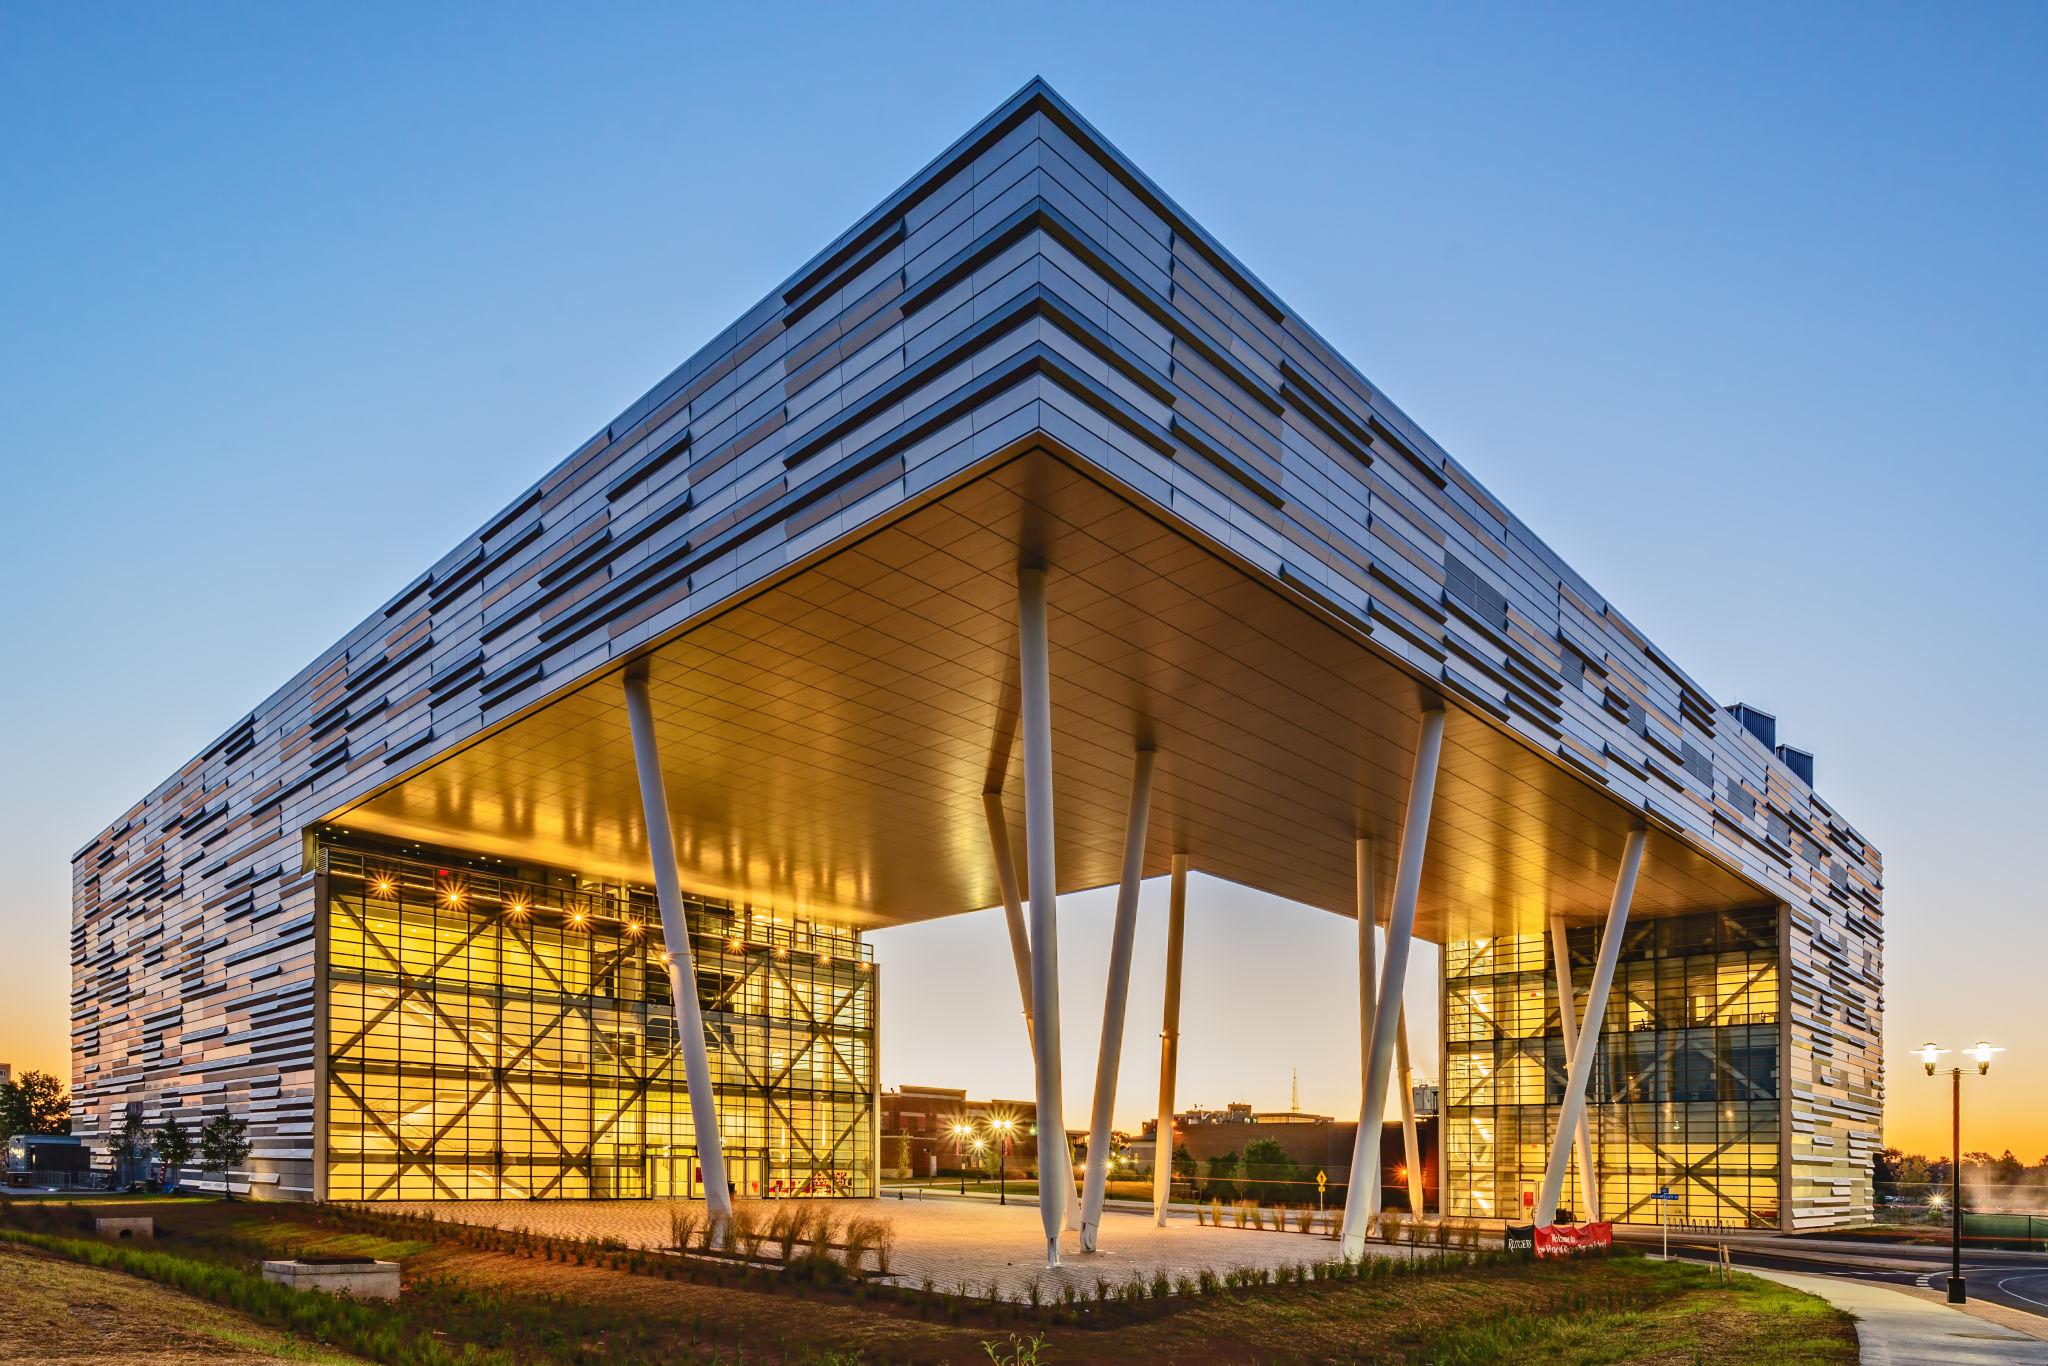 Rockafeller swank: Panels give business school 'corporate ...